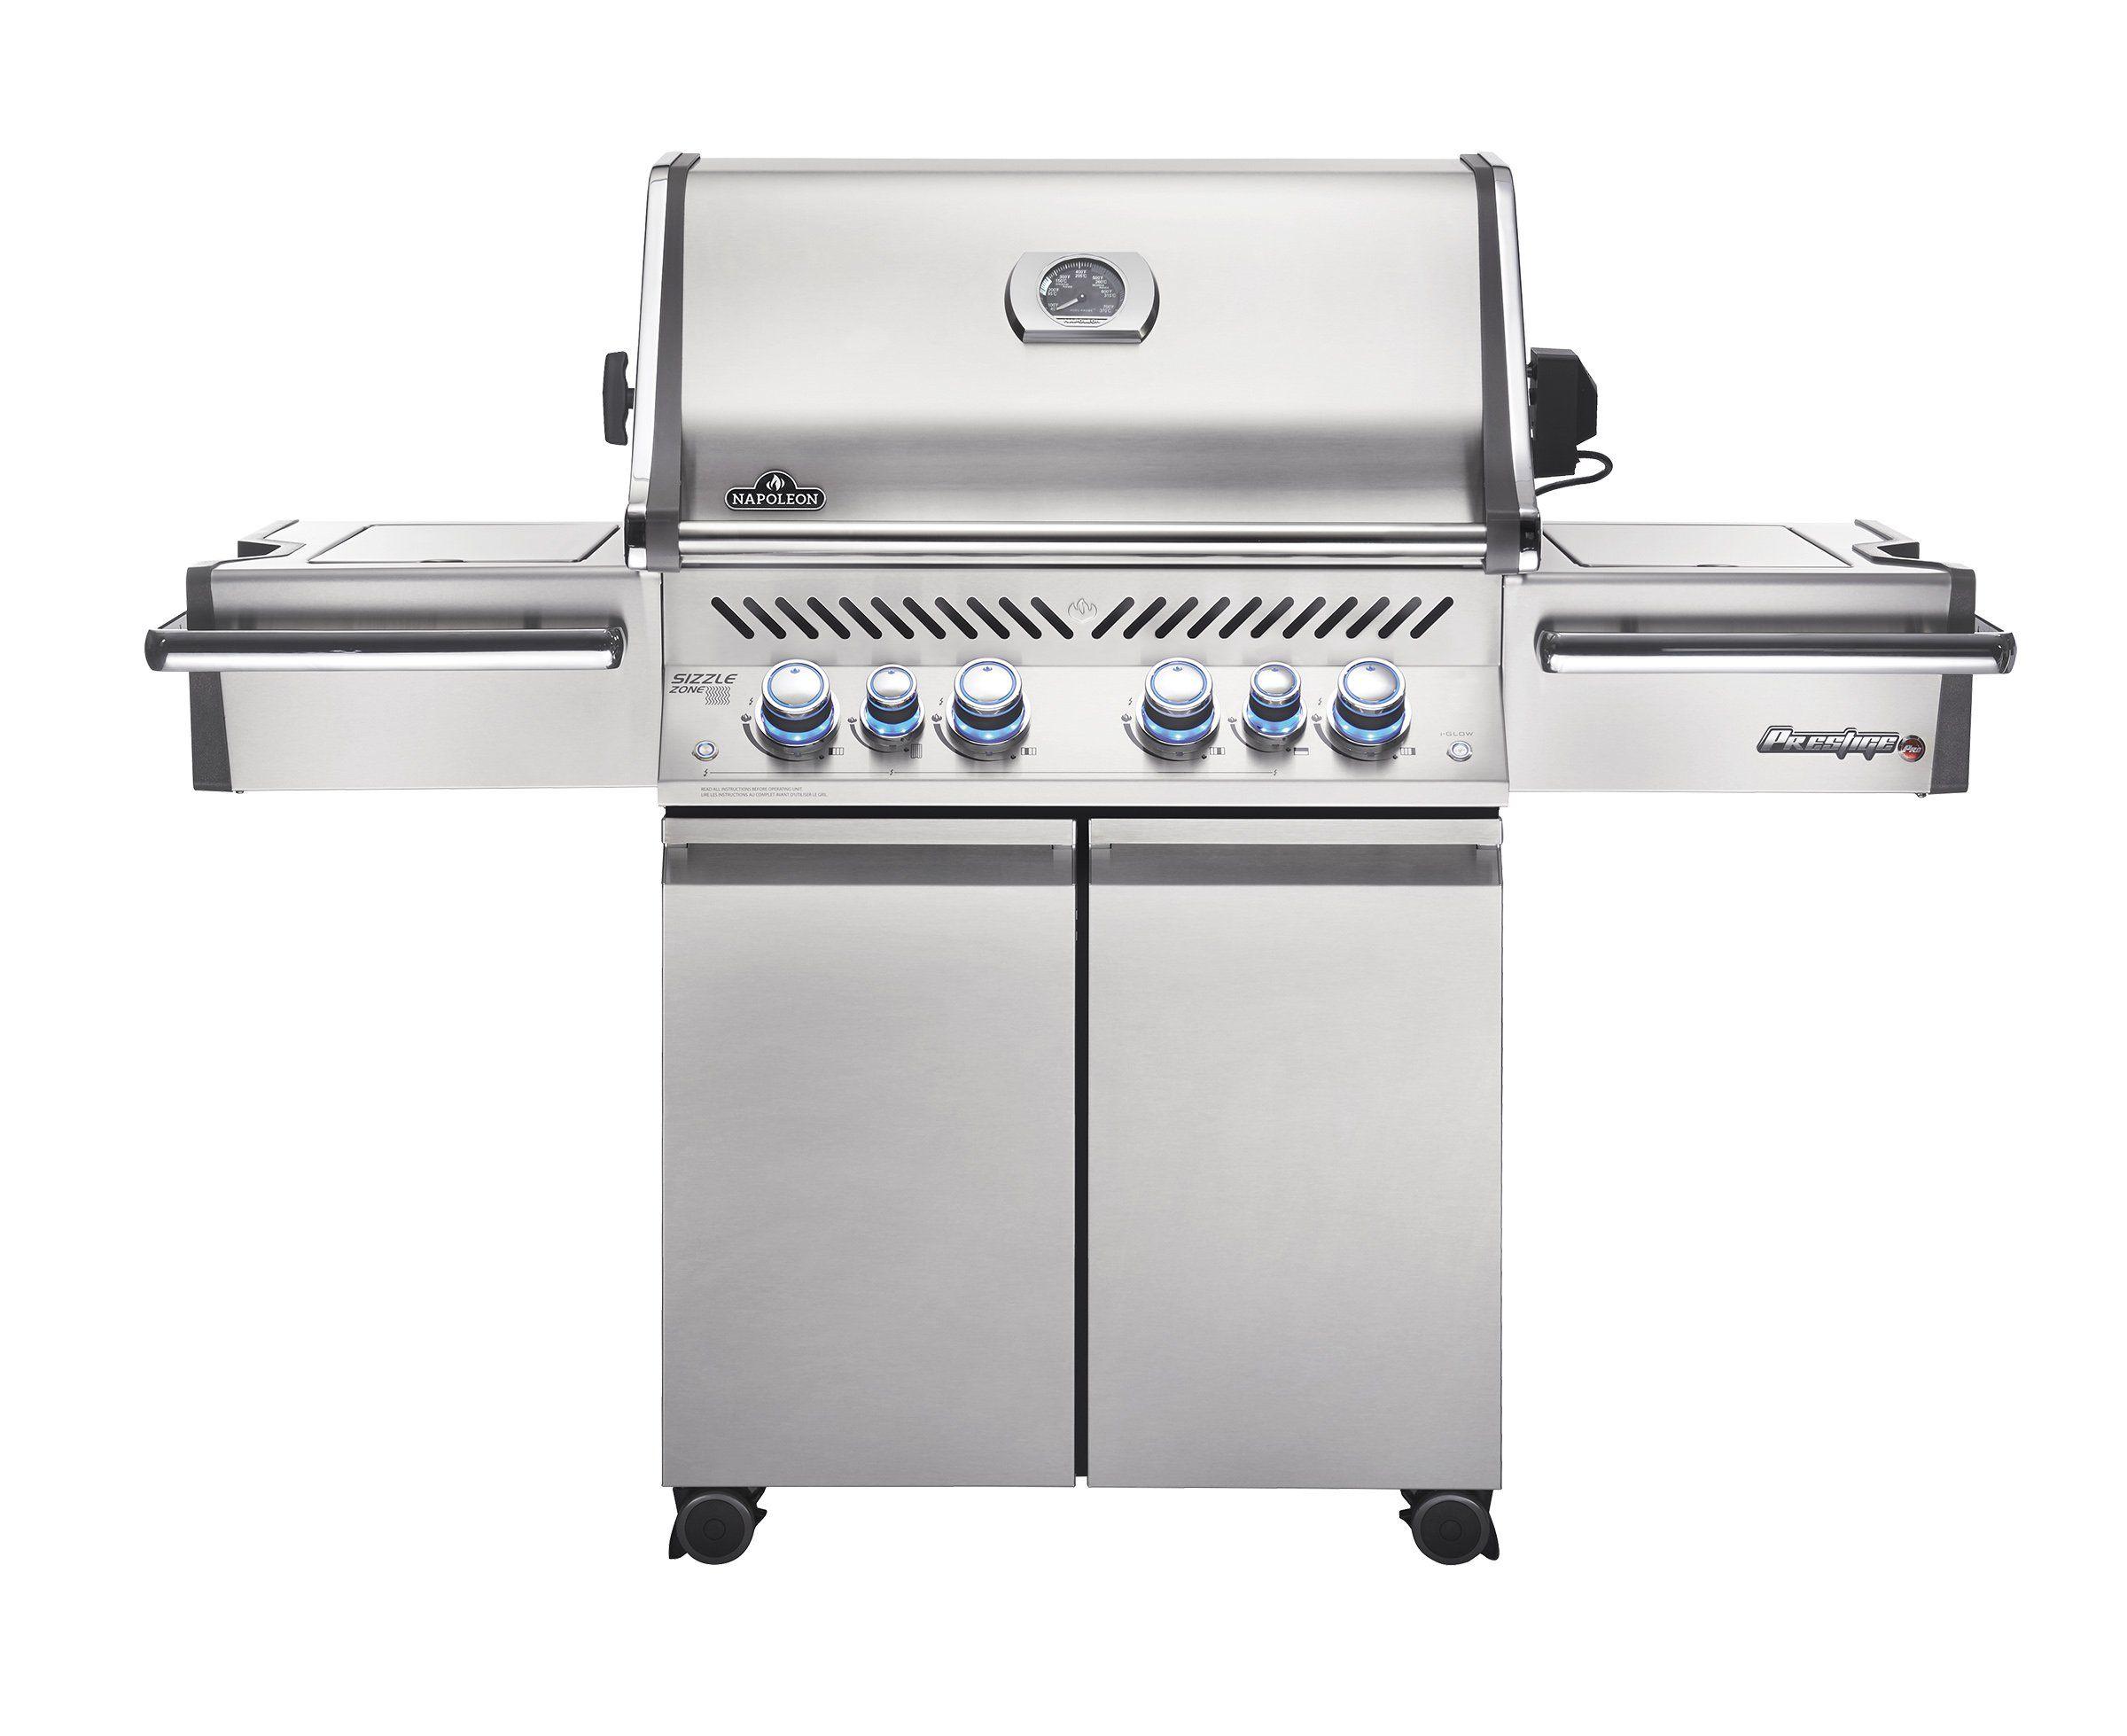 napoleon grills prestige pro 500 propane gas grill stainless